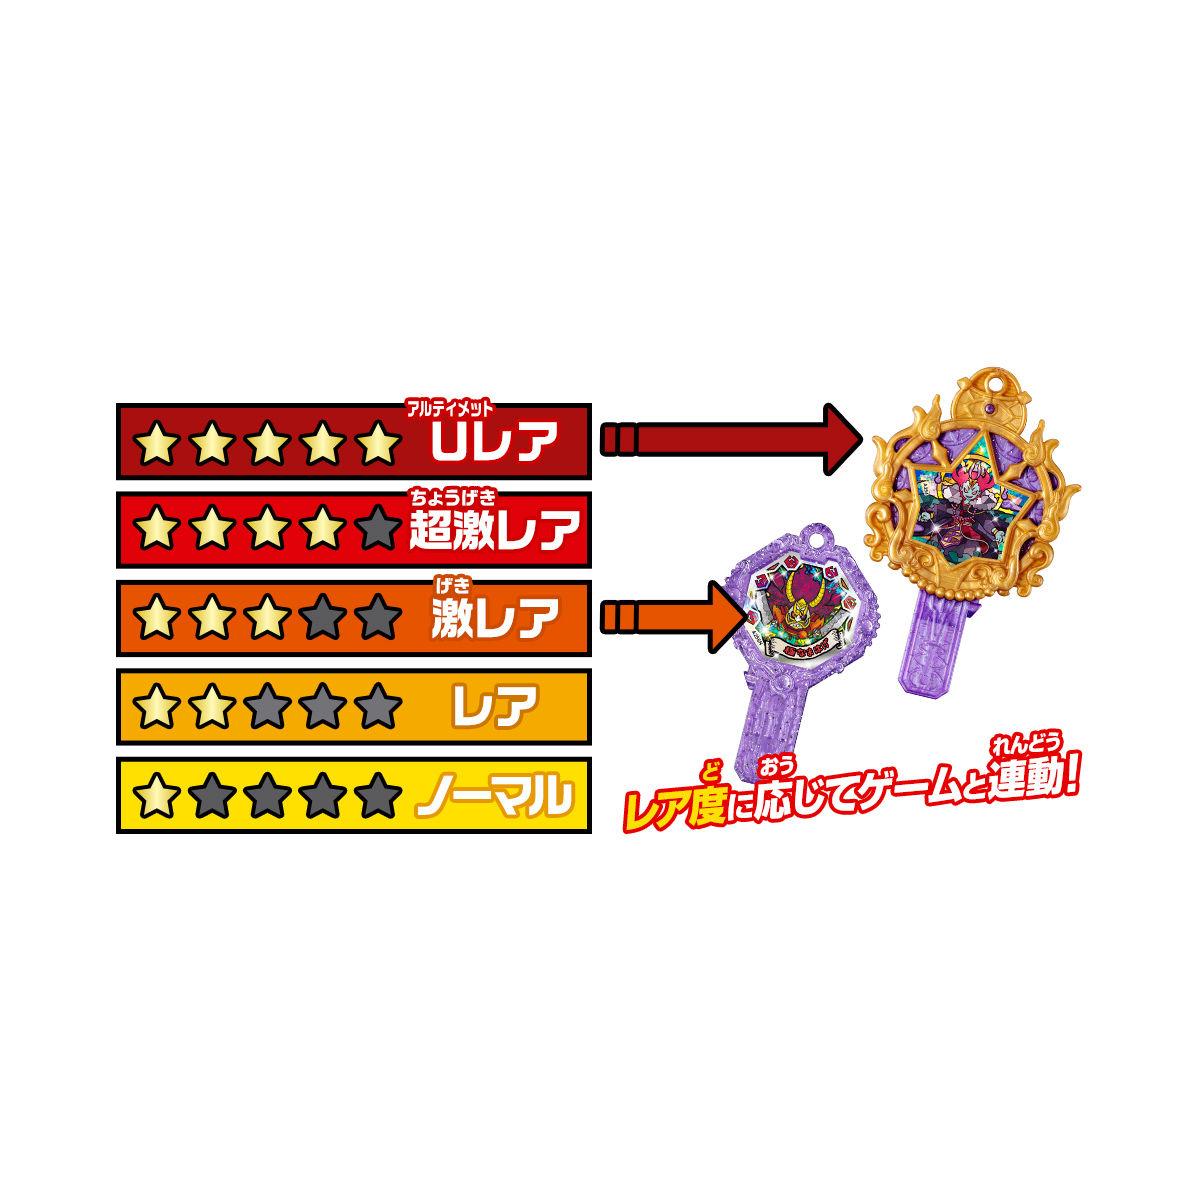 DX妖怪アークシリーズ02 妖魔一武道会 輪廻